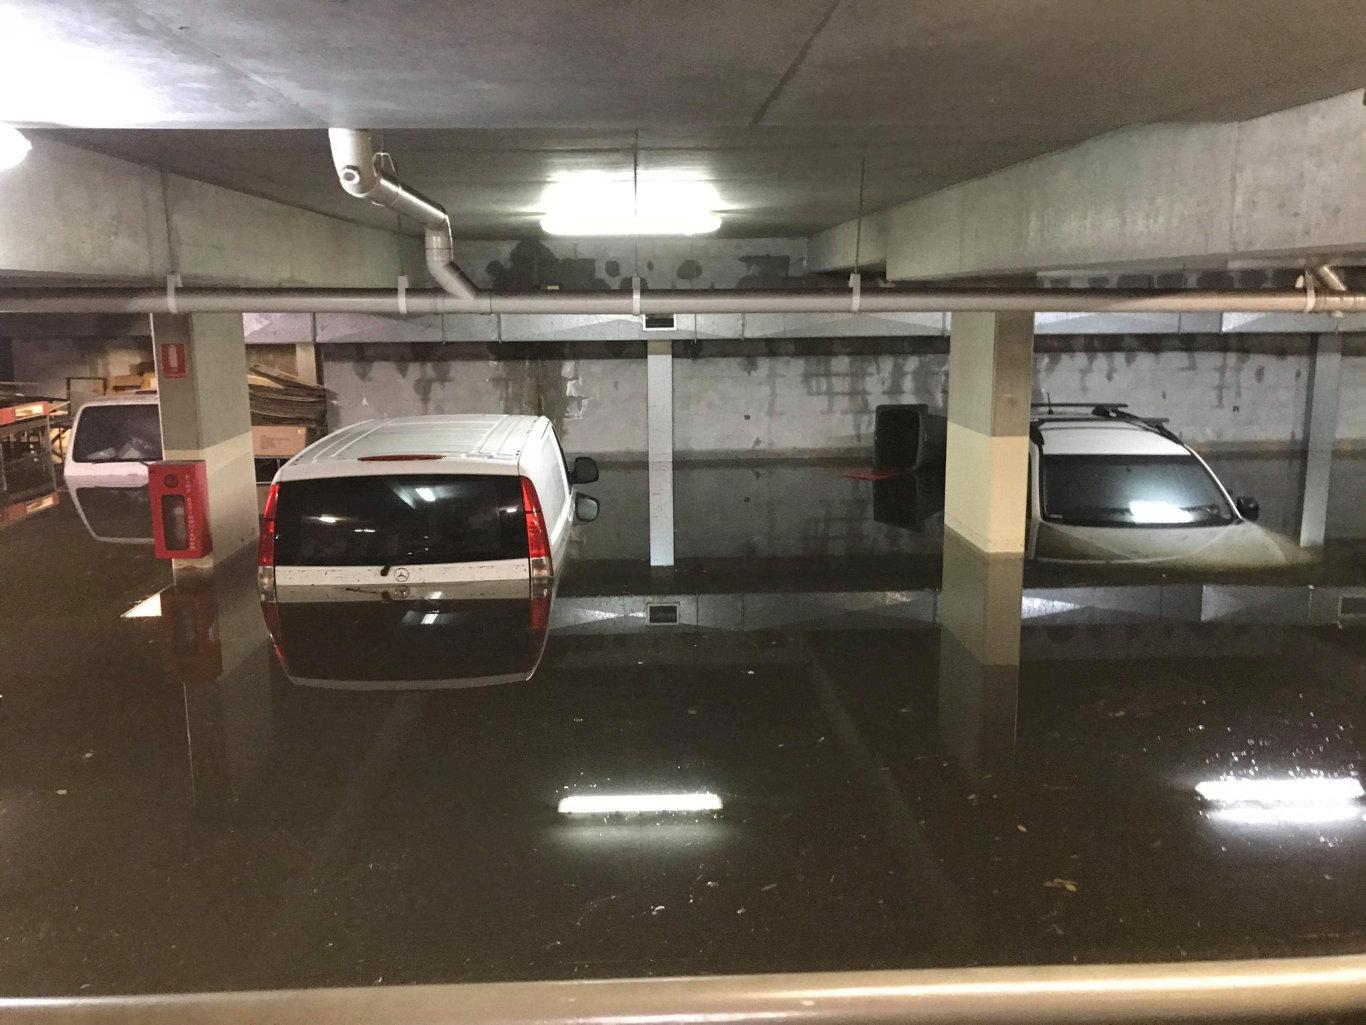 Flooding in a Byron Bay carpark.